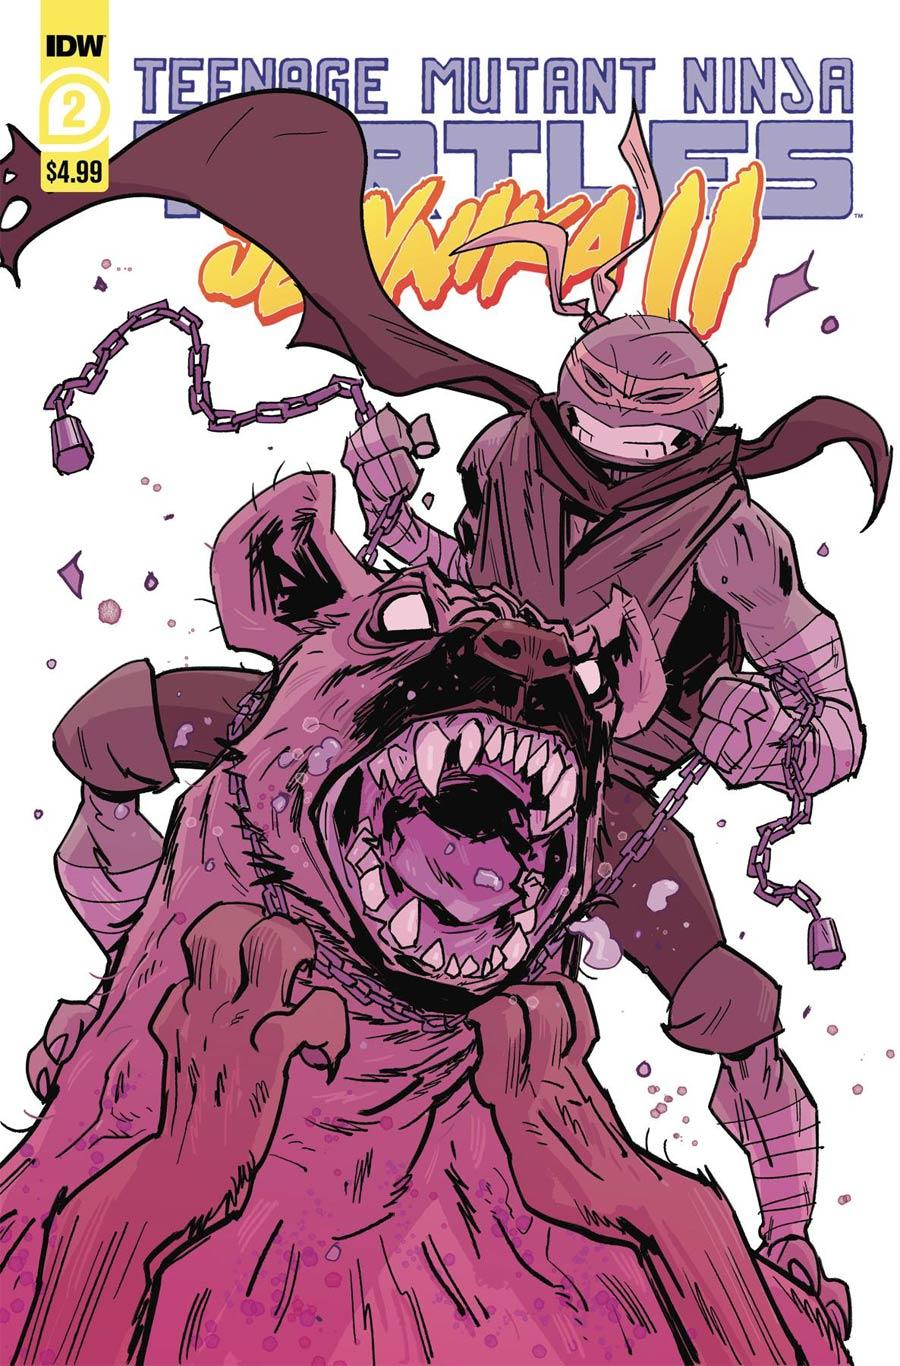 Teenage Mutant Ninja Turtles Jennika II #2 Cover A Regular Brahm Revel Cover